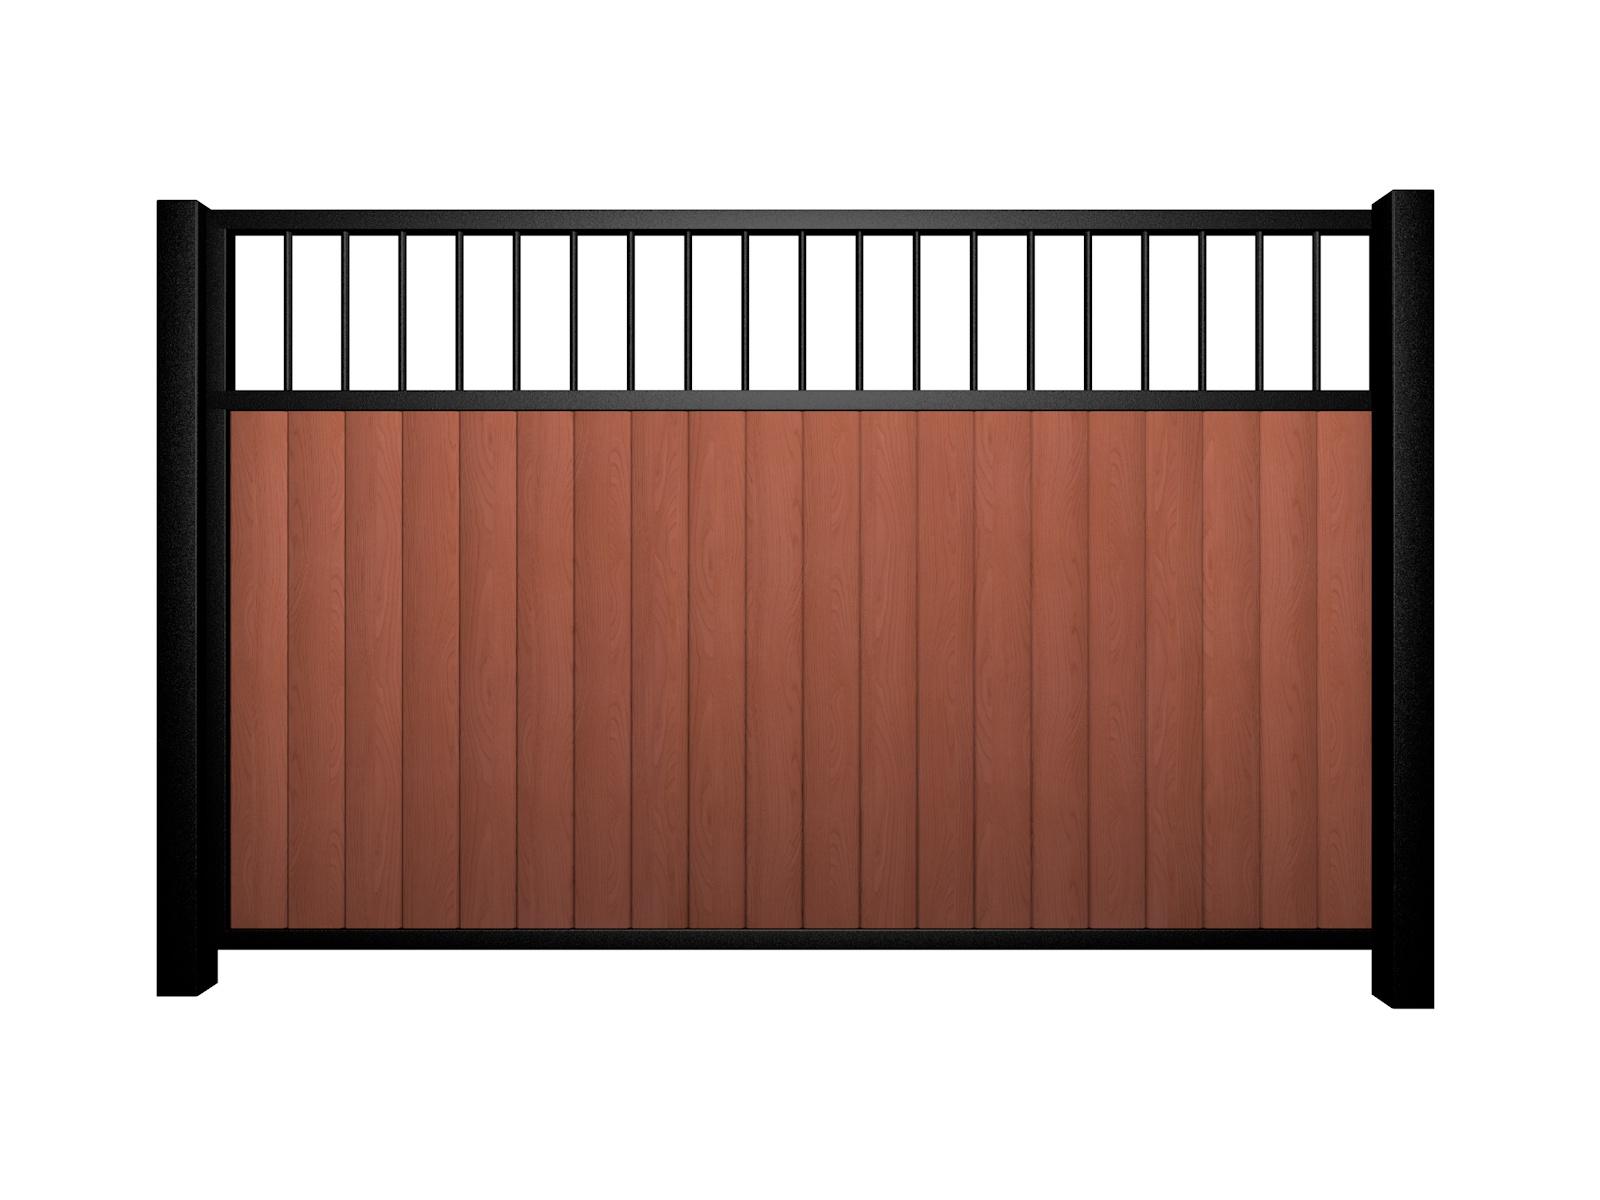 Sliding wood fill metal framed flat open top driveway gate